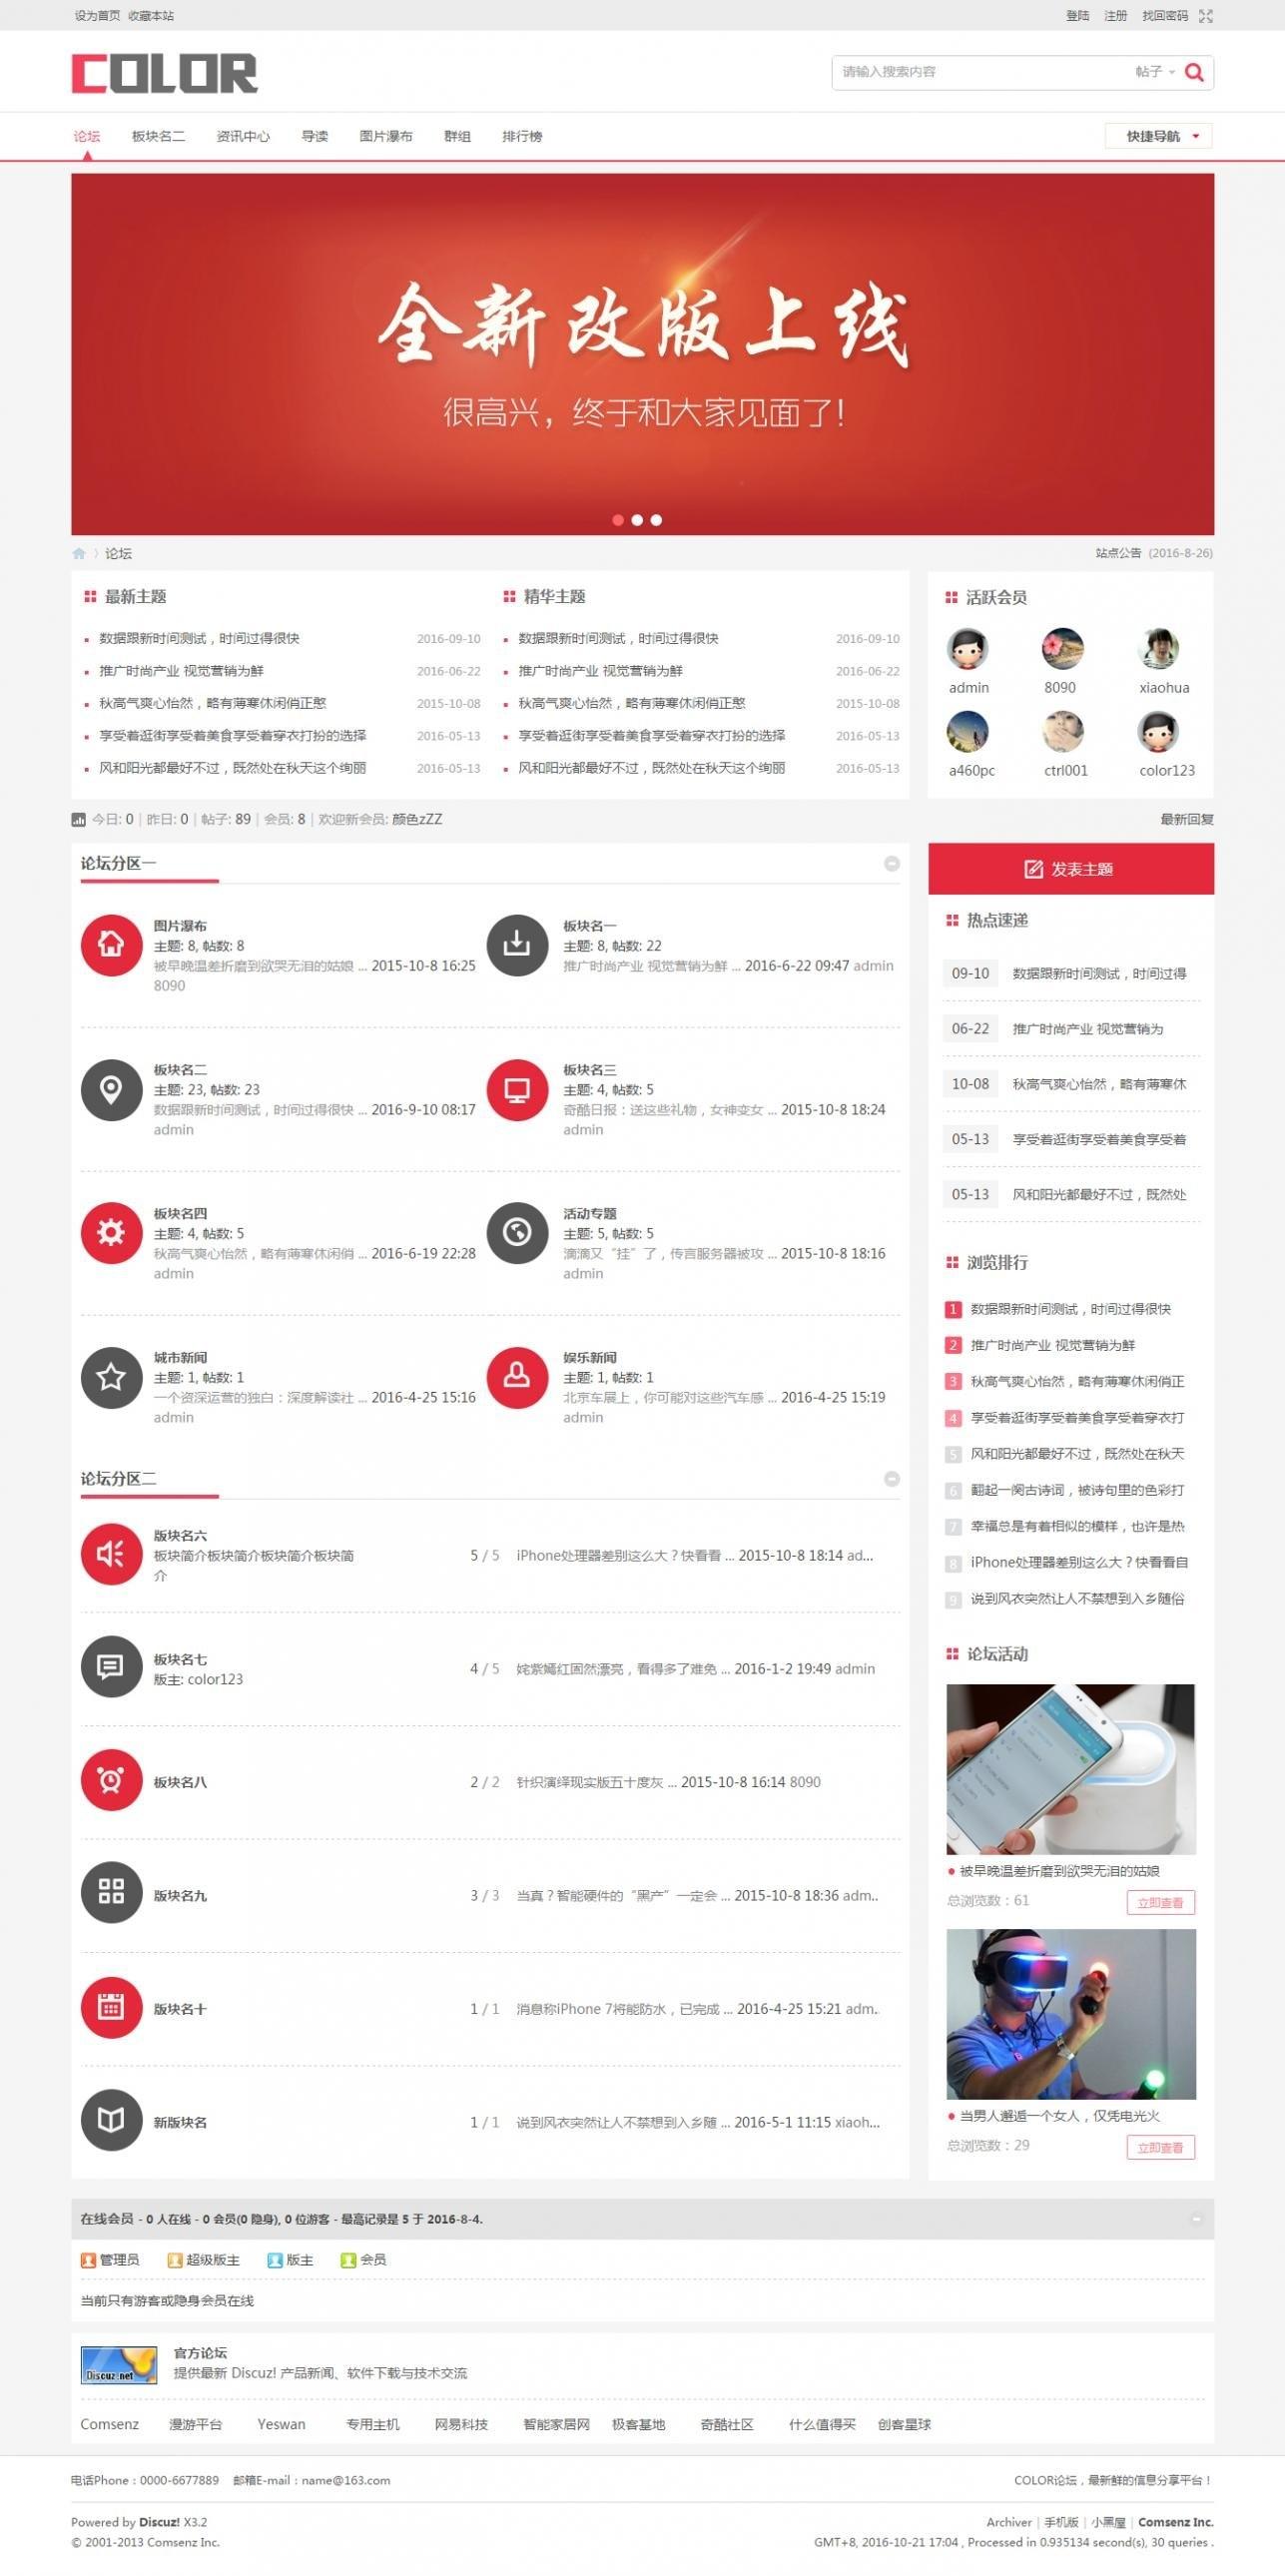 【Discuz炫彩论坛】多配色-color论坛Discuz x3.x模板 商业版 GBK编码模板